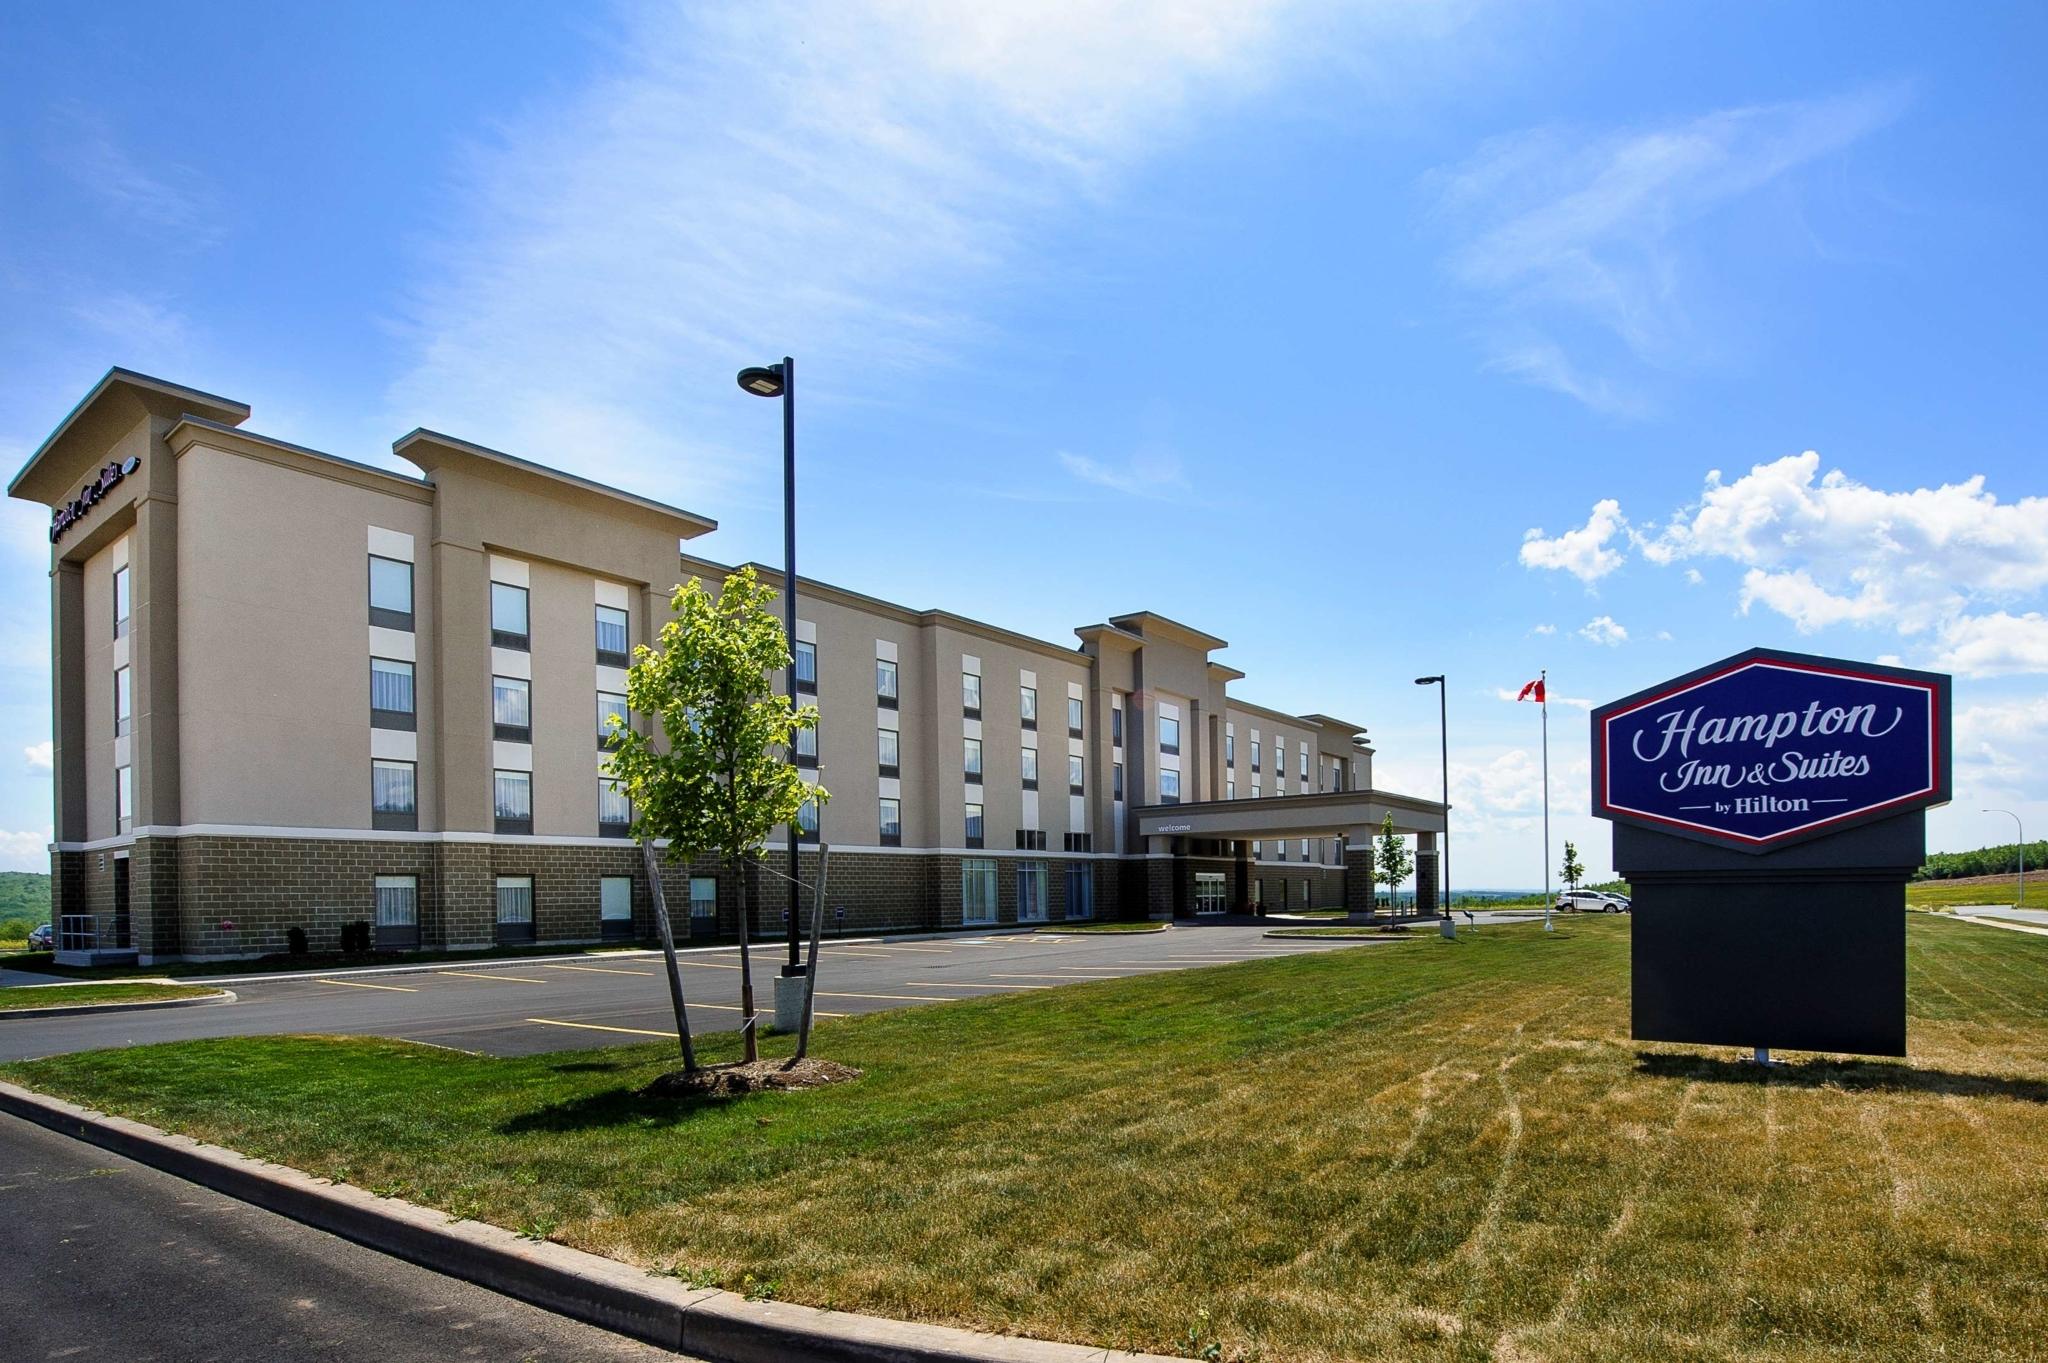 Hampton Inn & Suites by Hilton Truro - Hotels